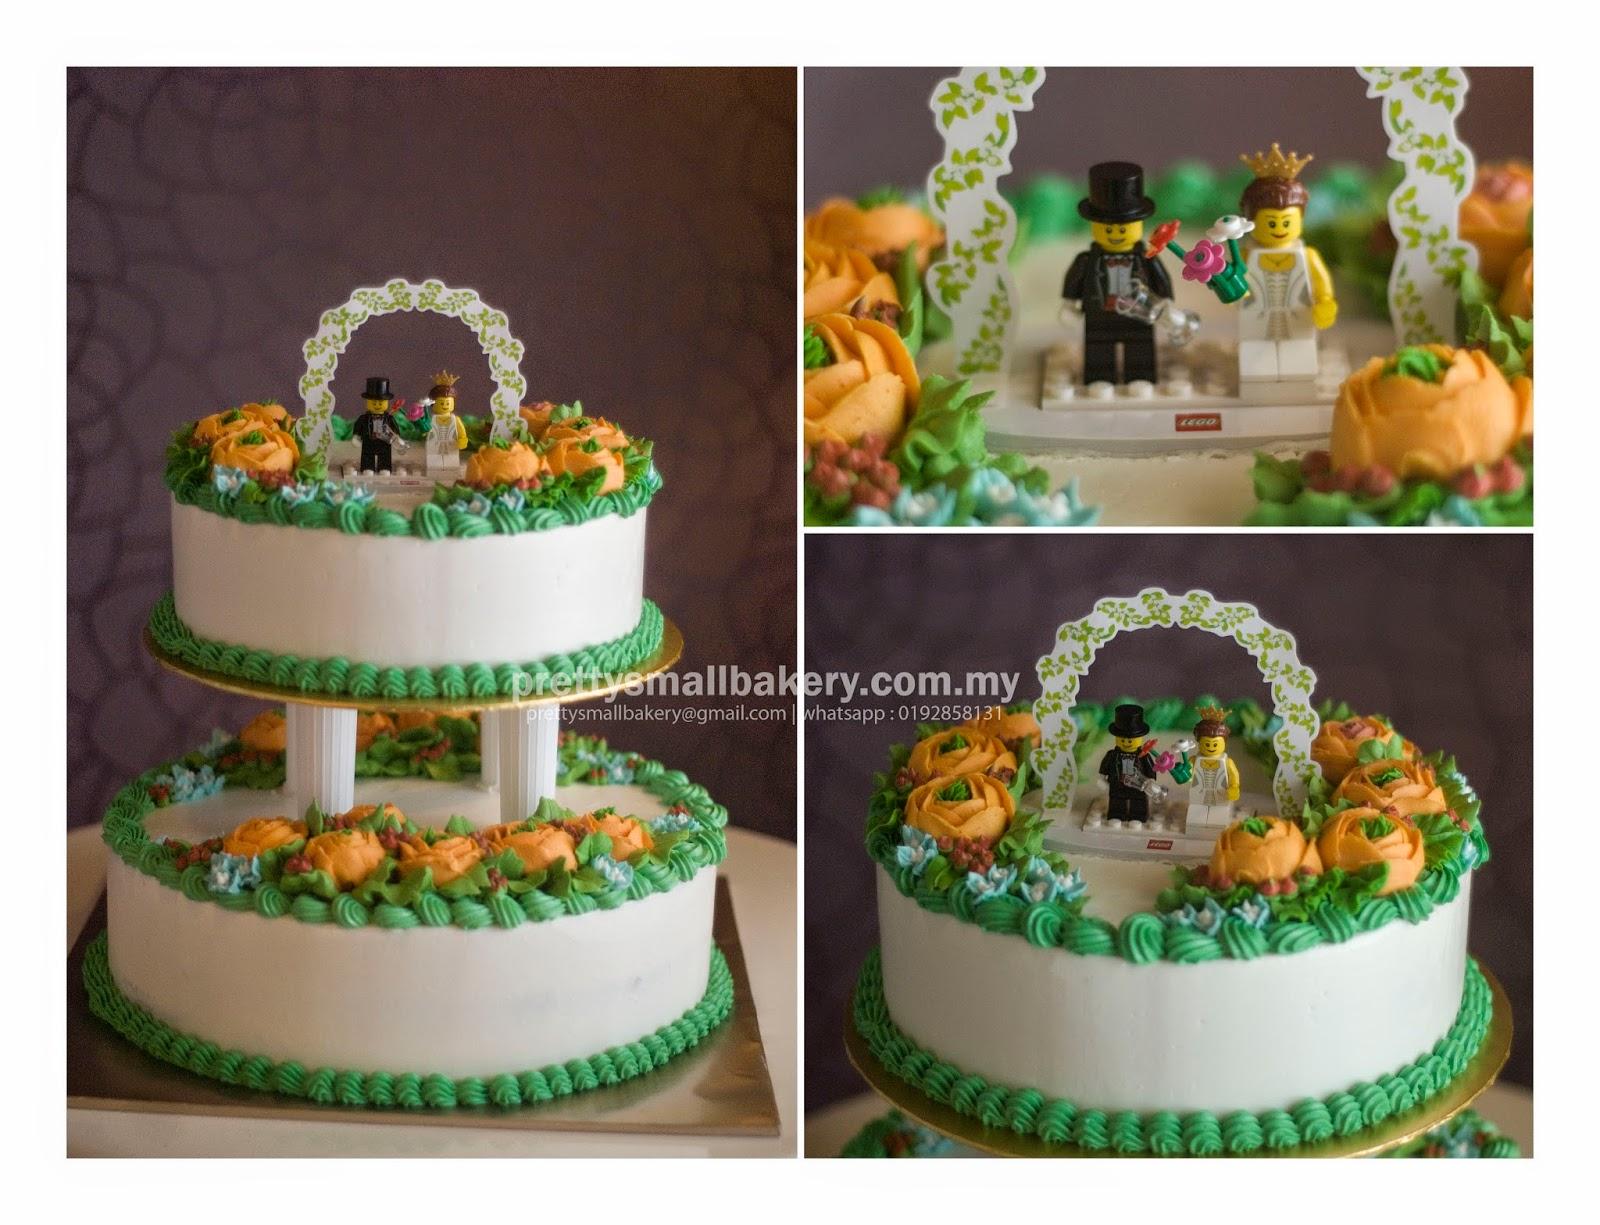 kkek ultraman, edibale image for printing, ek hantaran berbentuk bantal, kek unik, kek hantaran di shah alam, kek kahwin, kek kahwin murah BELAJAR BUAT KEK, KEK HALAL, KEK SHAH ALAM, KEK KAHWIN, KEK PENGANTIN, KEK TUNANG, KEK CANTIK, KEK UNIK, KEK SHAH ALAM